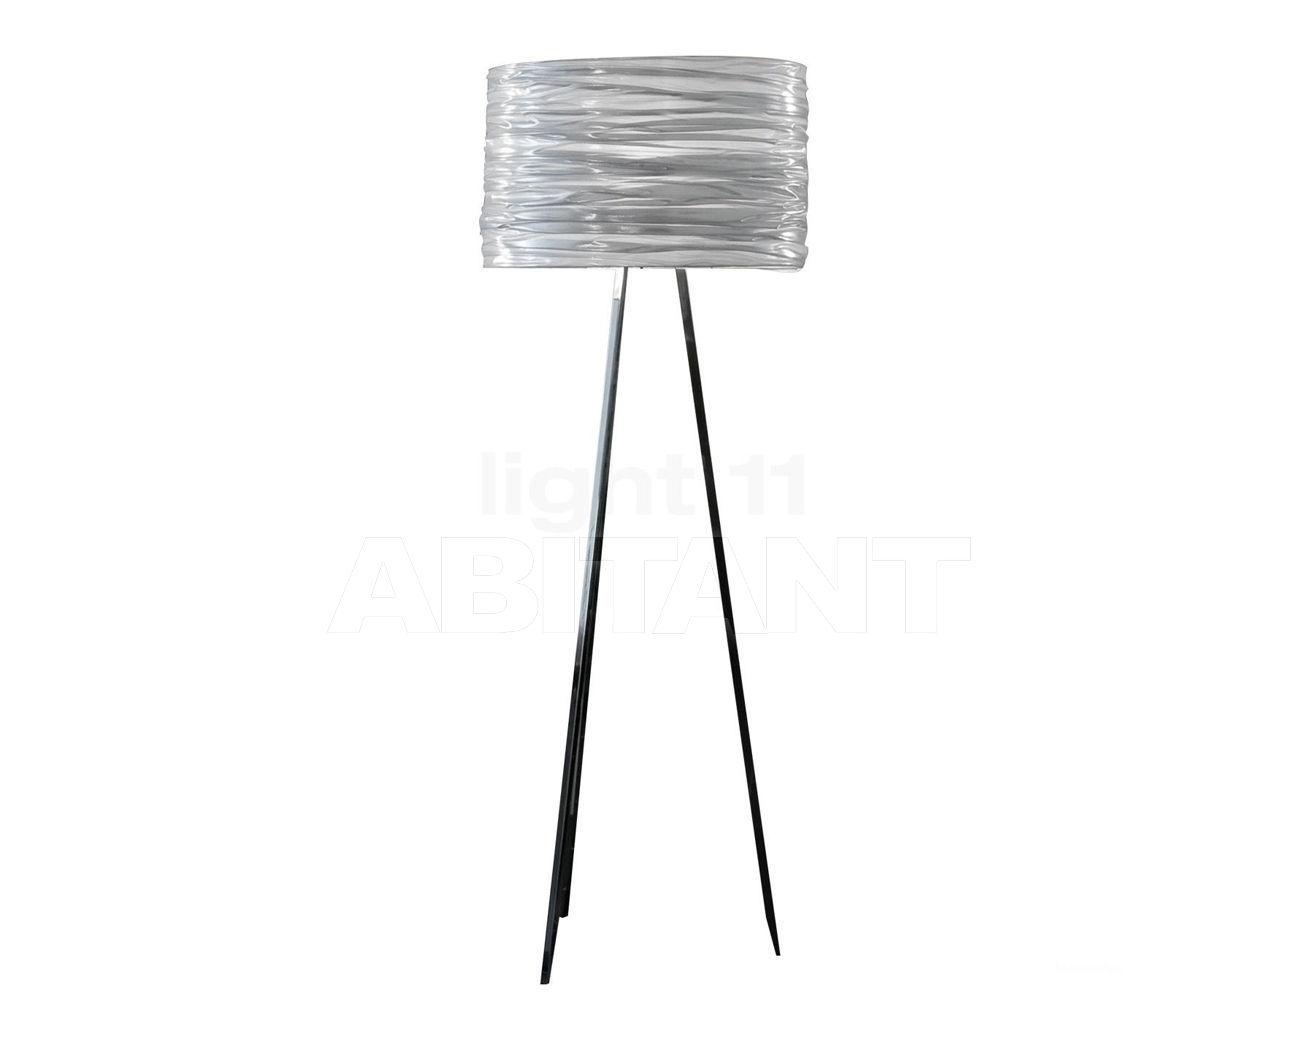 Купить Торшер Molto Luce G.m.b.H. Illuminazione 541-1001 541-14503